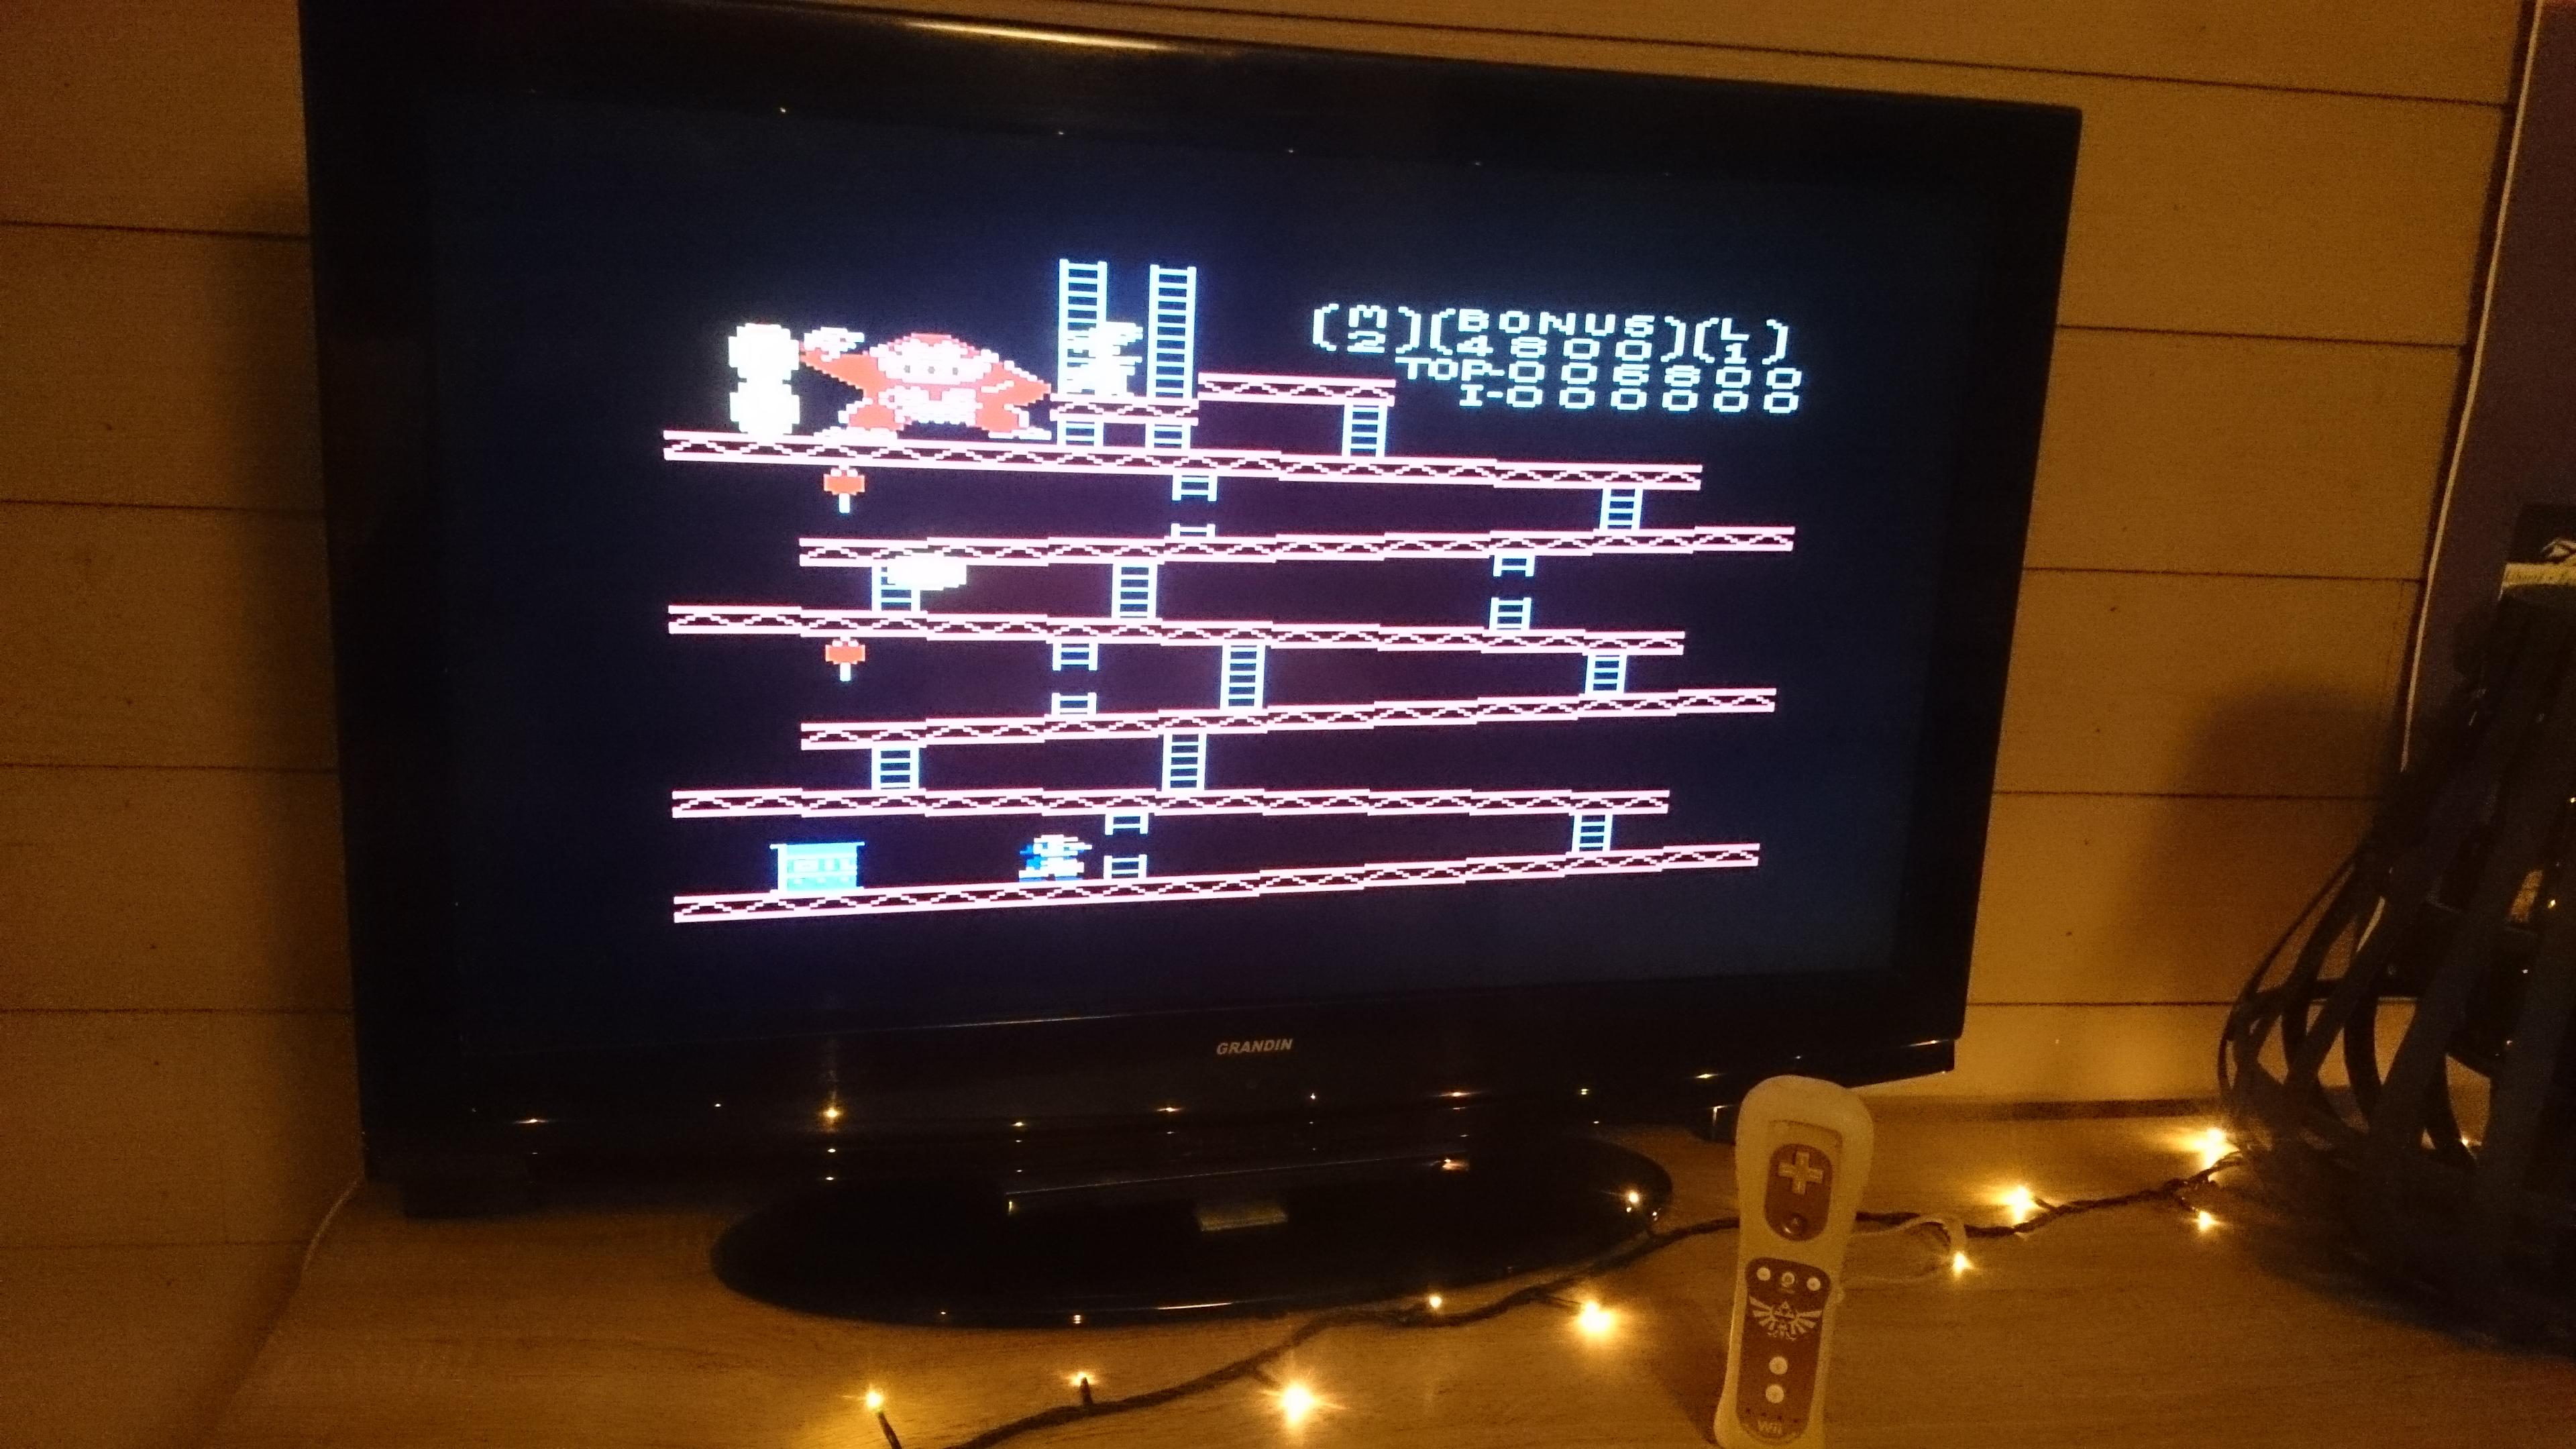 EddieNiceguy: Donkey Kong: Standard (Atari 7800 Emulated) 6,800 points on 2017-12-06 11:06:22